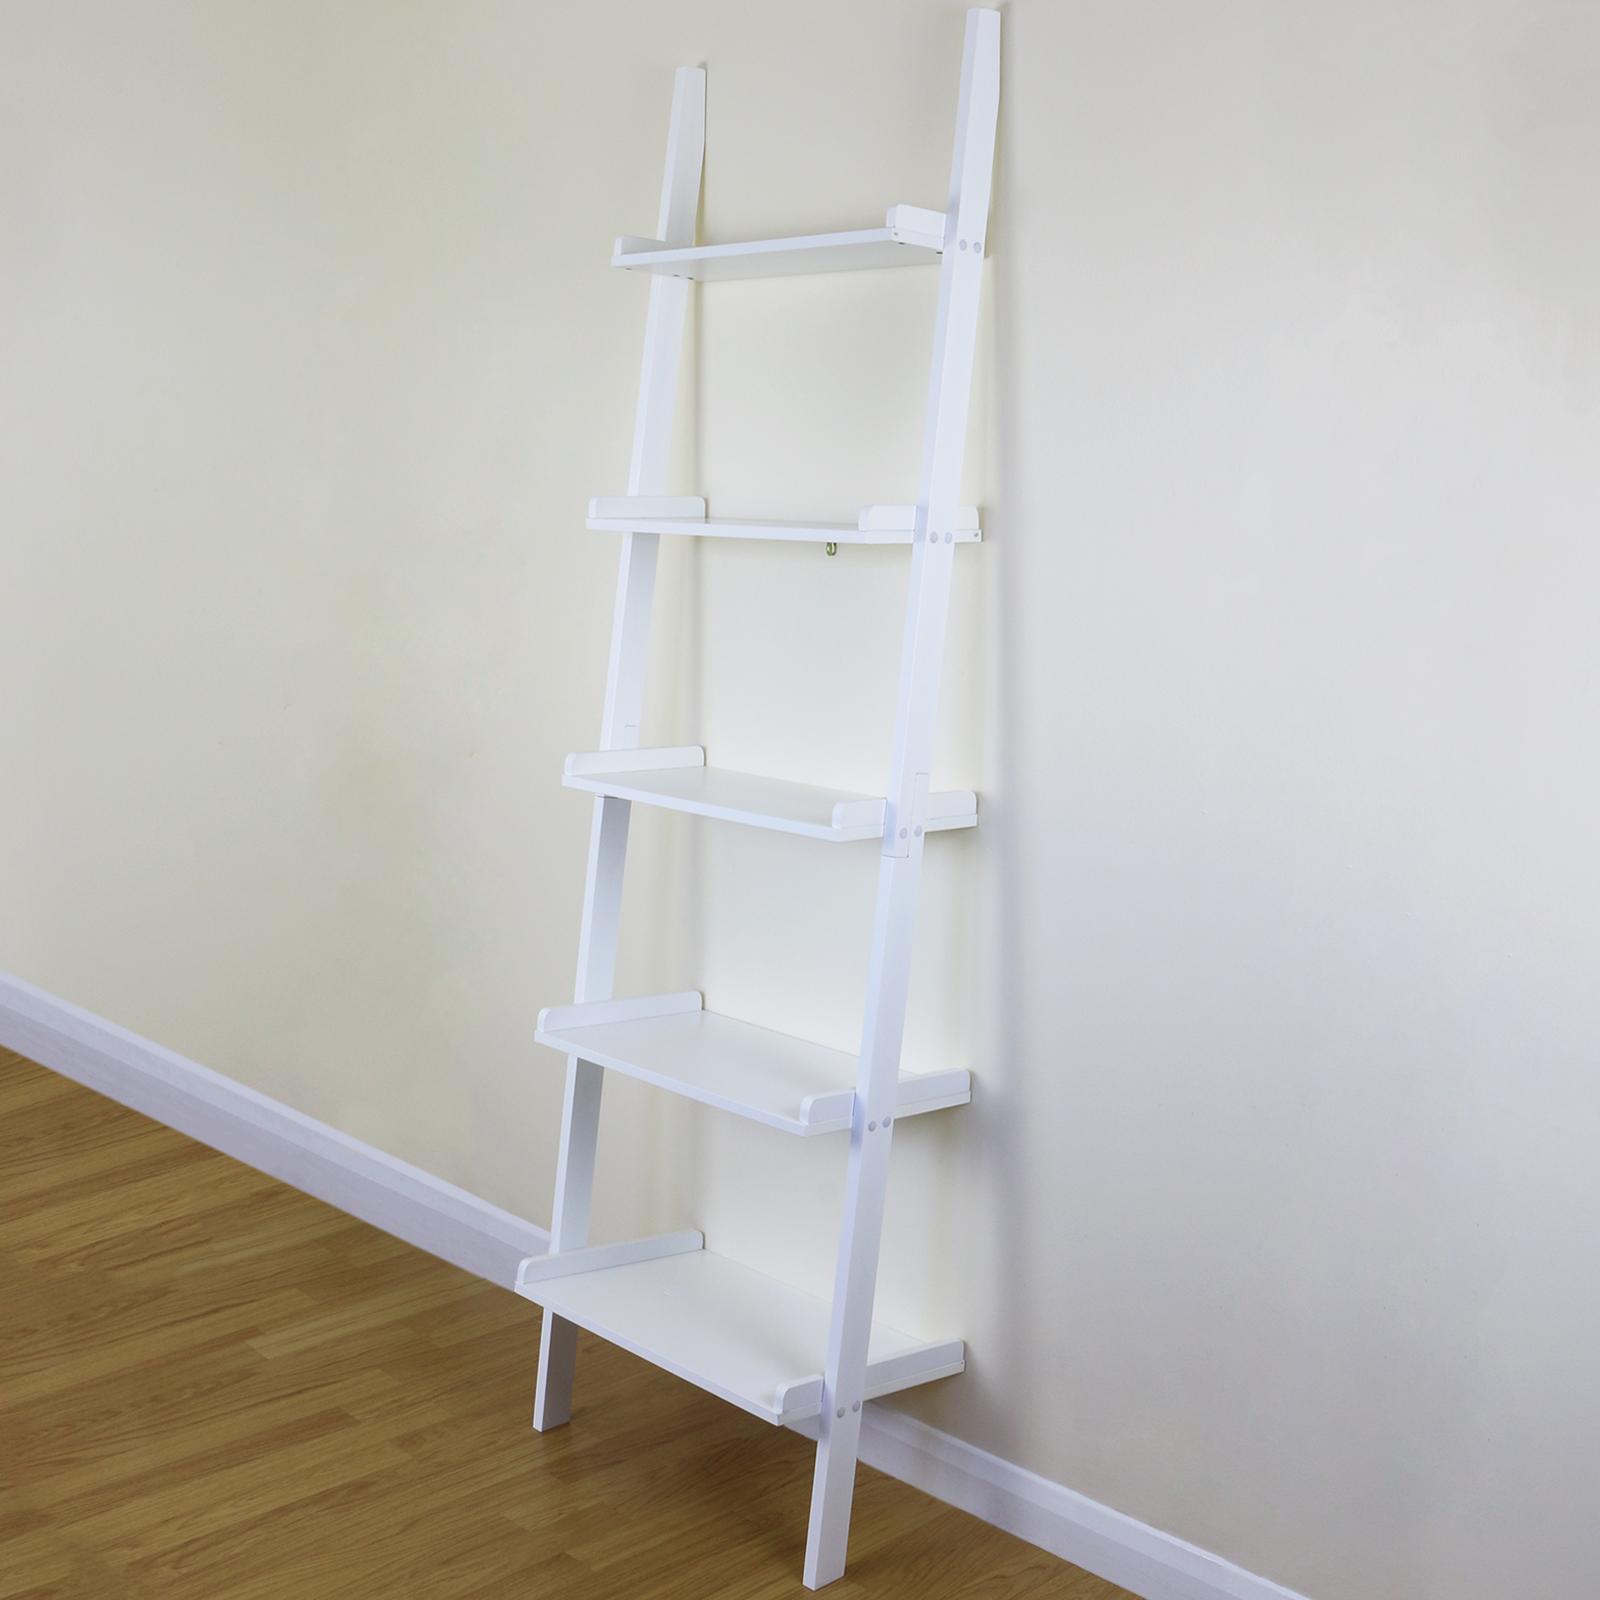 5 Tier White Ladder Wall Shelf Home Storage Display Unit